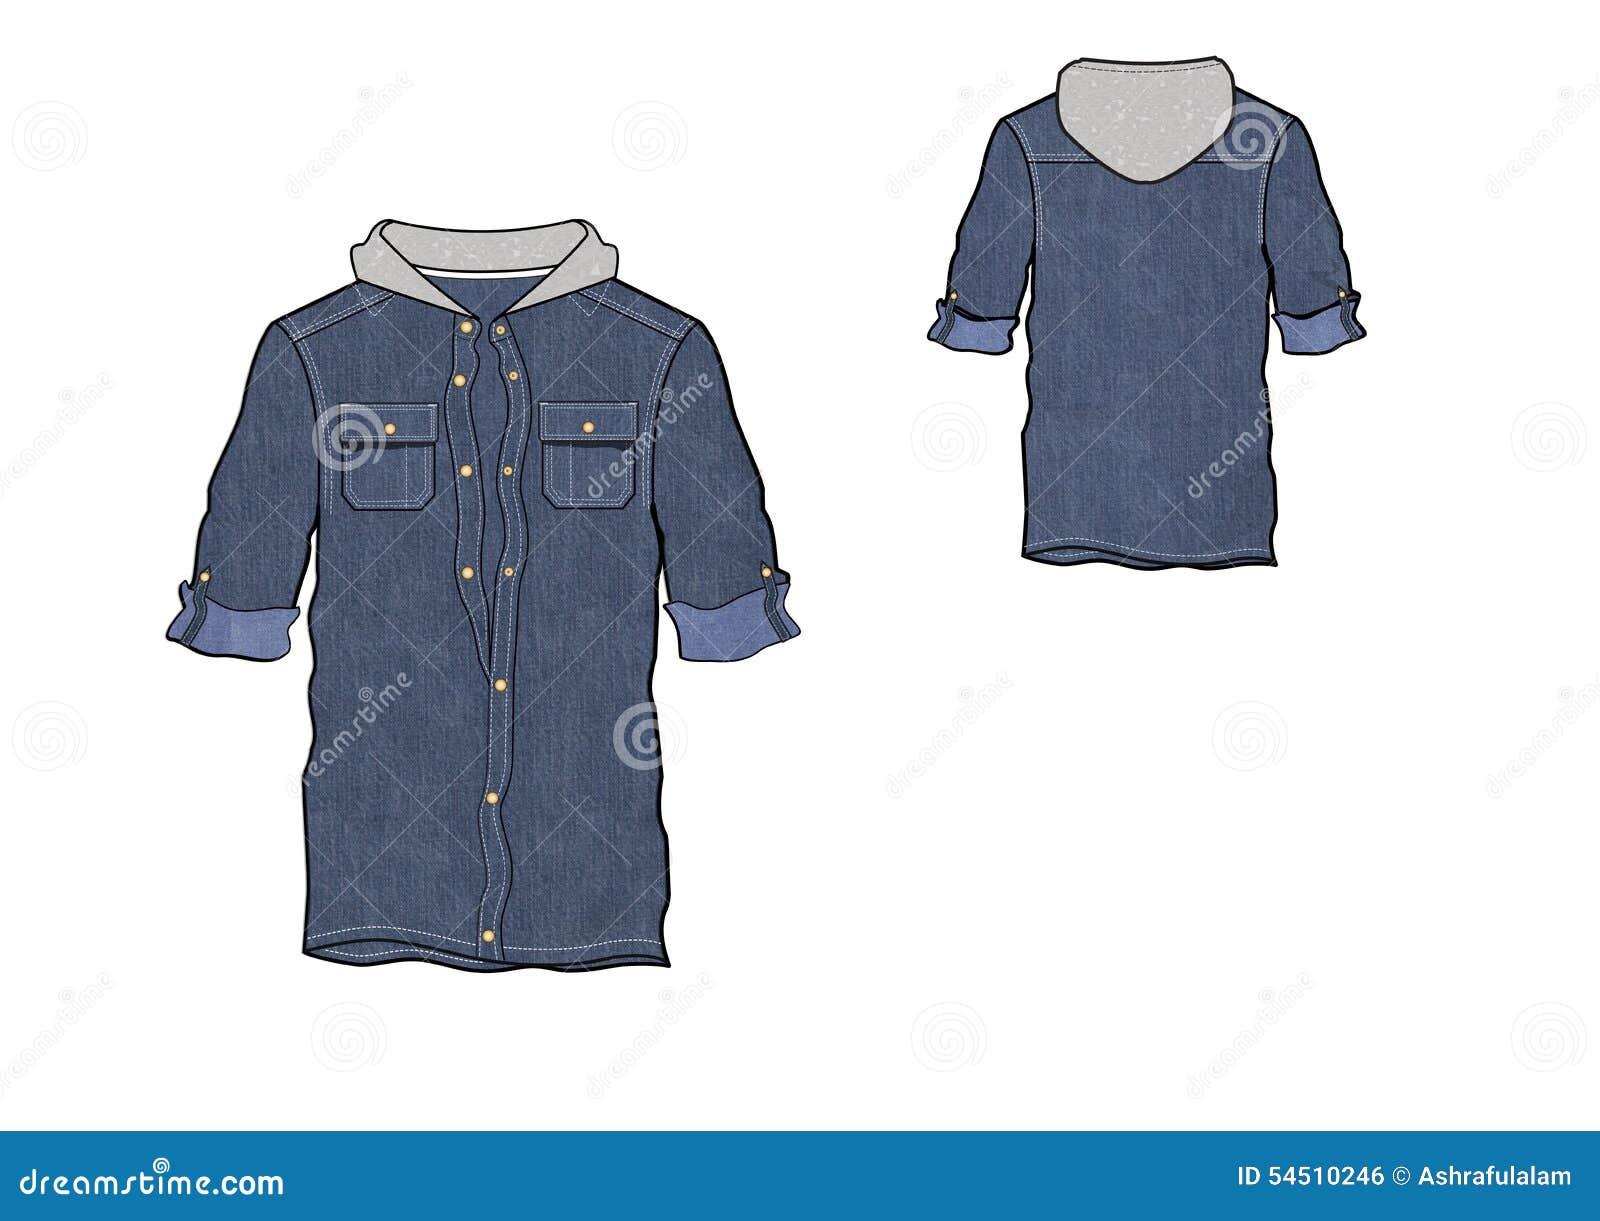 Shirt design illustrator template - Template Of Denim Roll Up Hood Shirt Design Royalty Free Stock Image